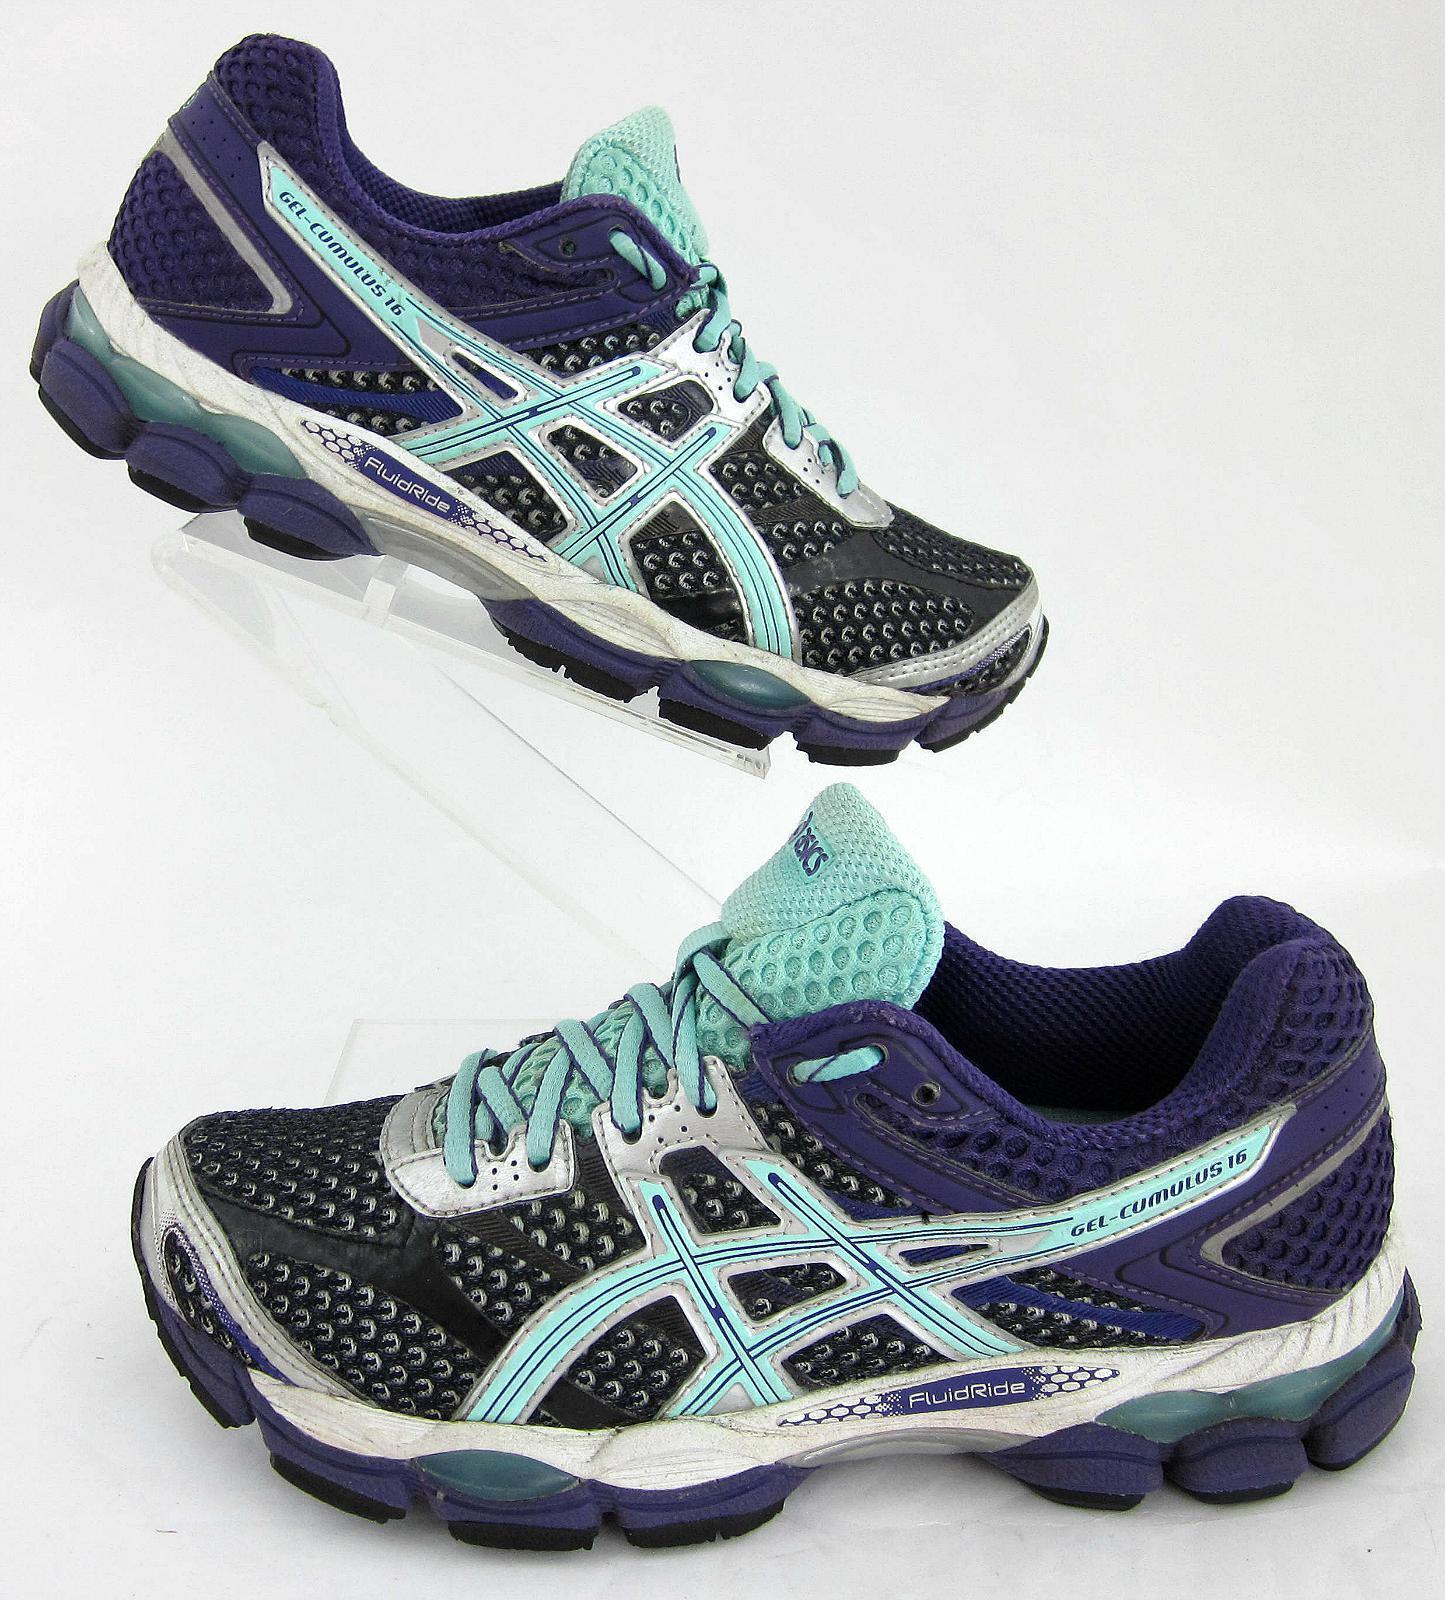 Asics Gel-Cumulus 16 femmes  Running  Chaussures  Onyx Beach Glass  Violet  Sz 6